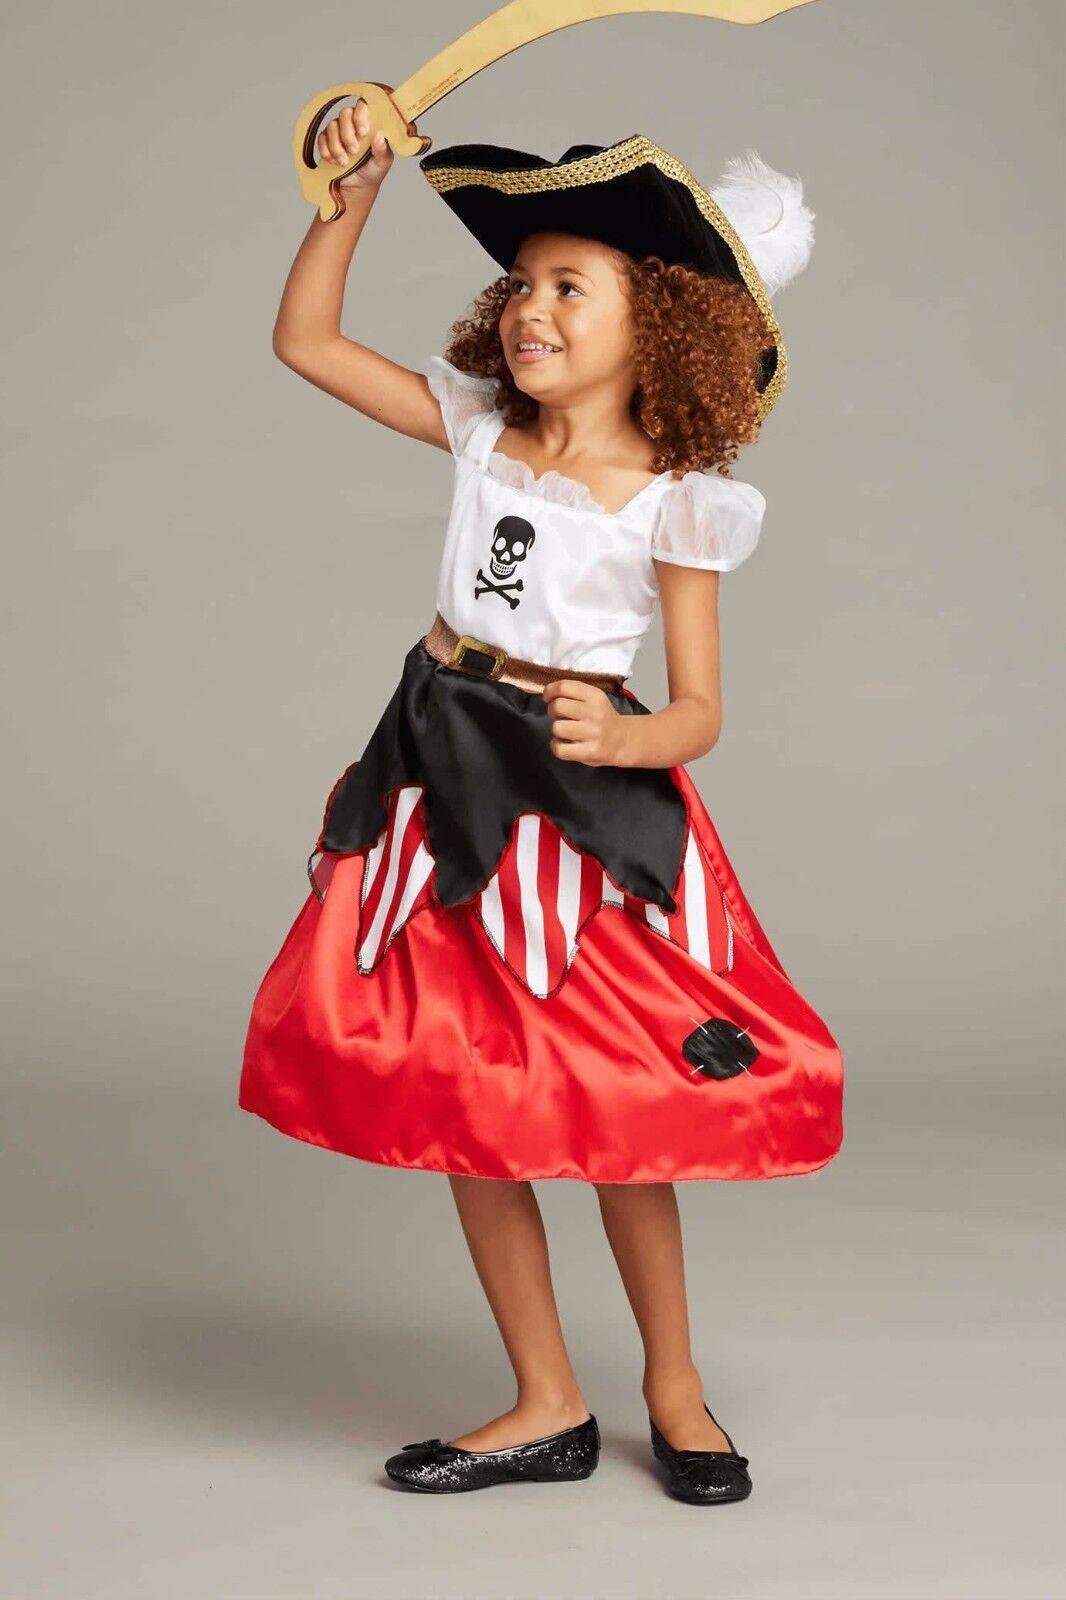 Chasing Fireflies Princess & Pirate for Girls Costume Revers